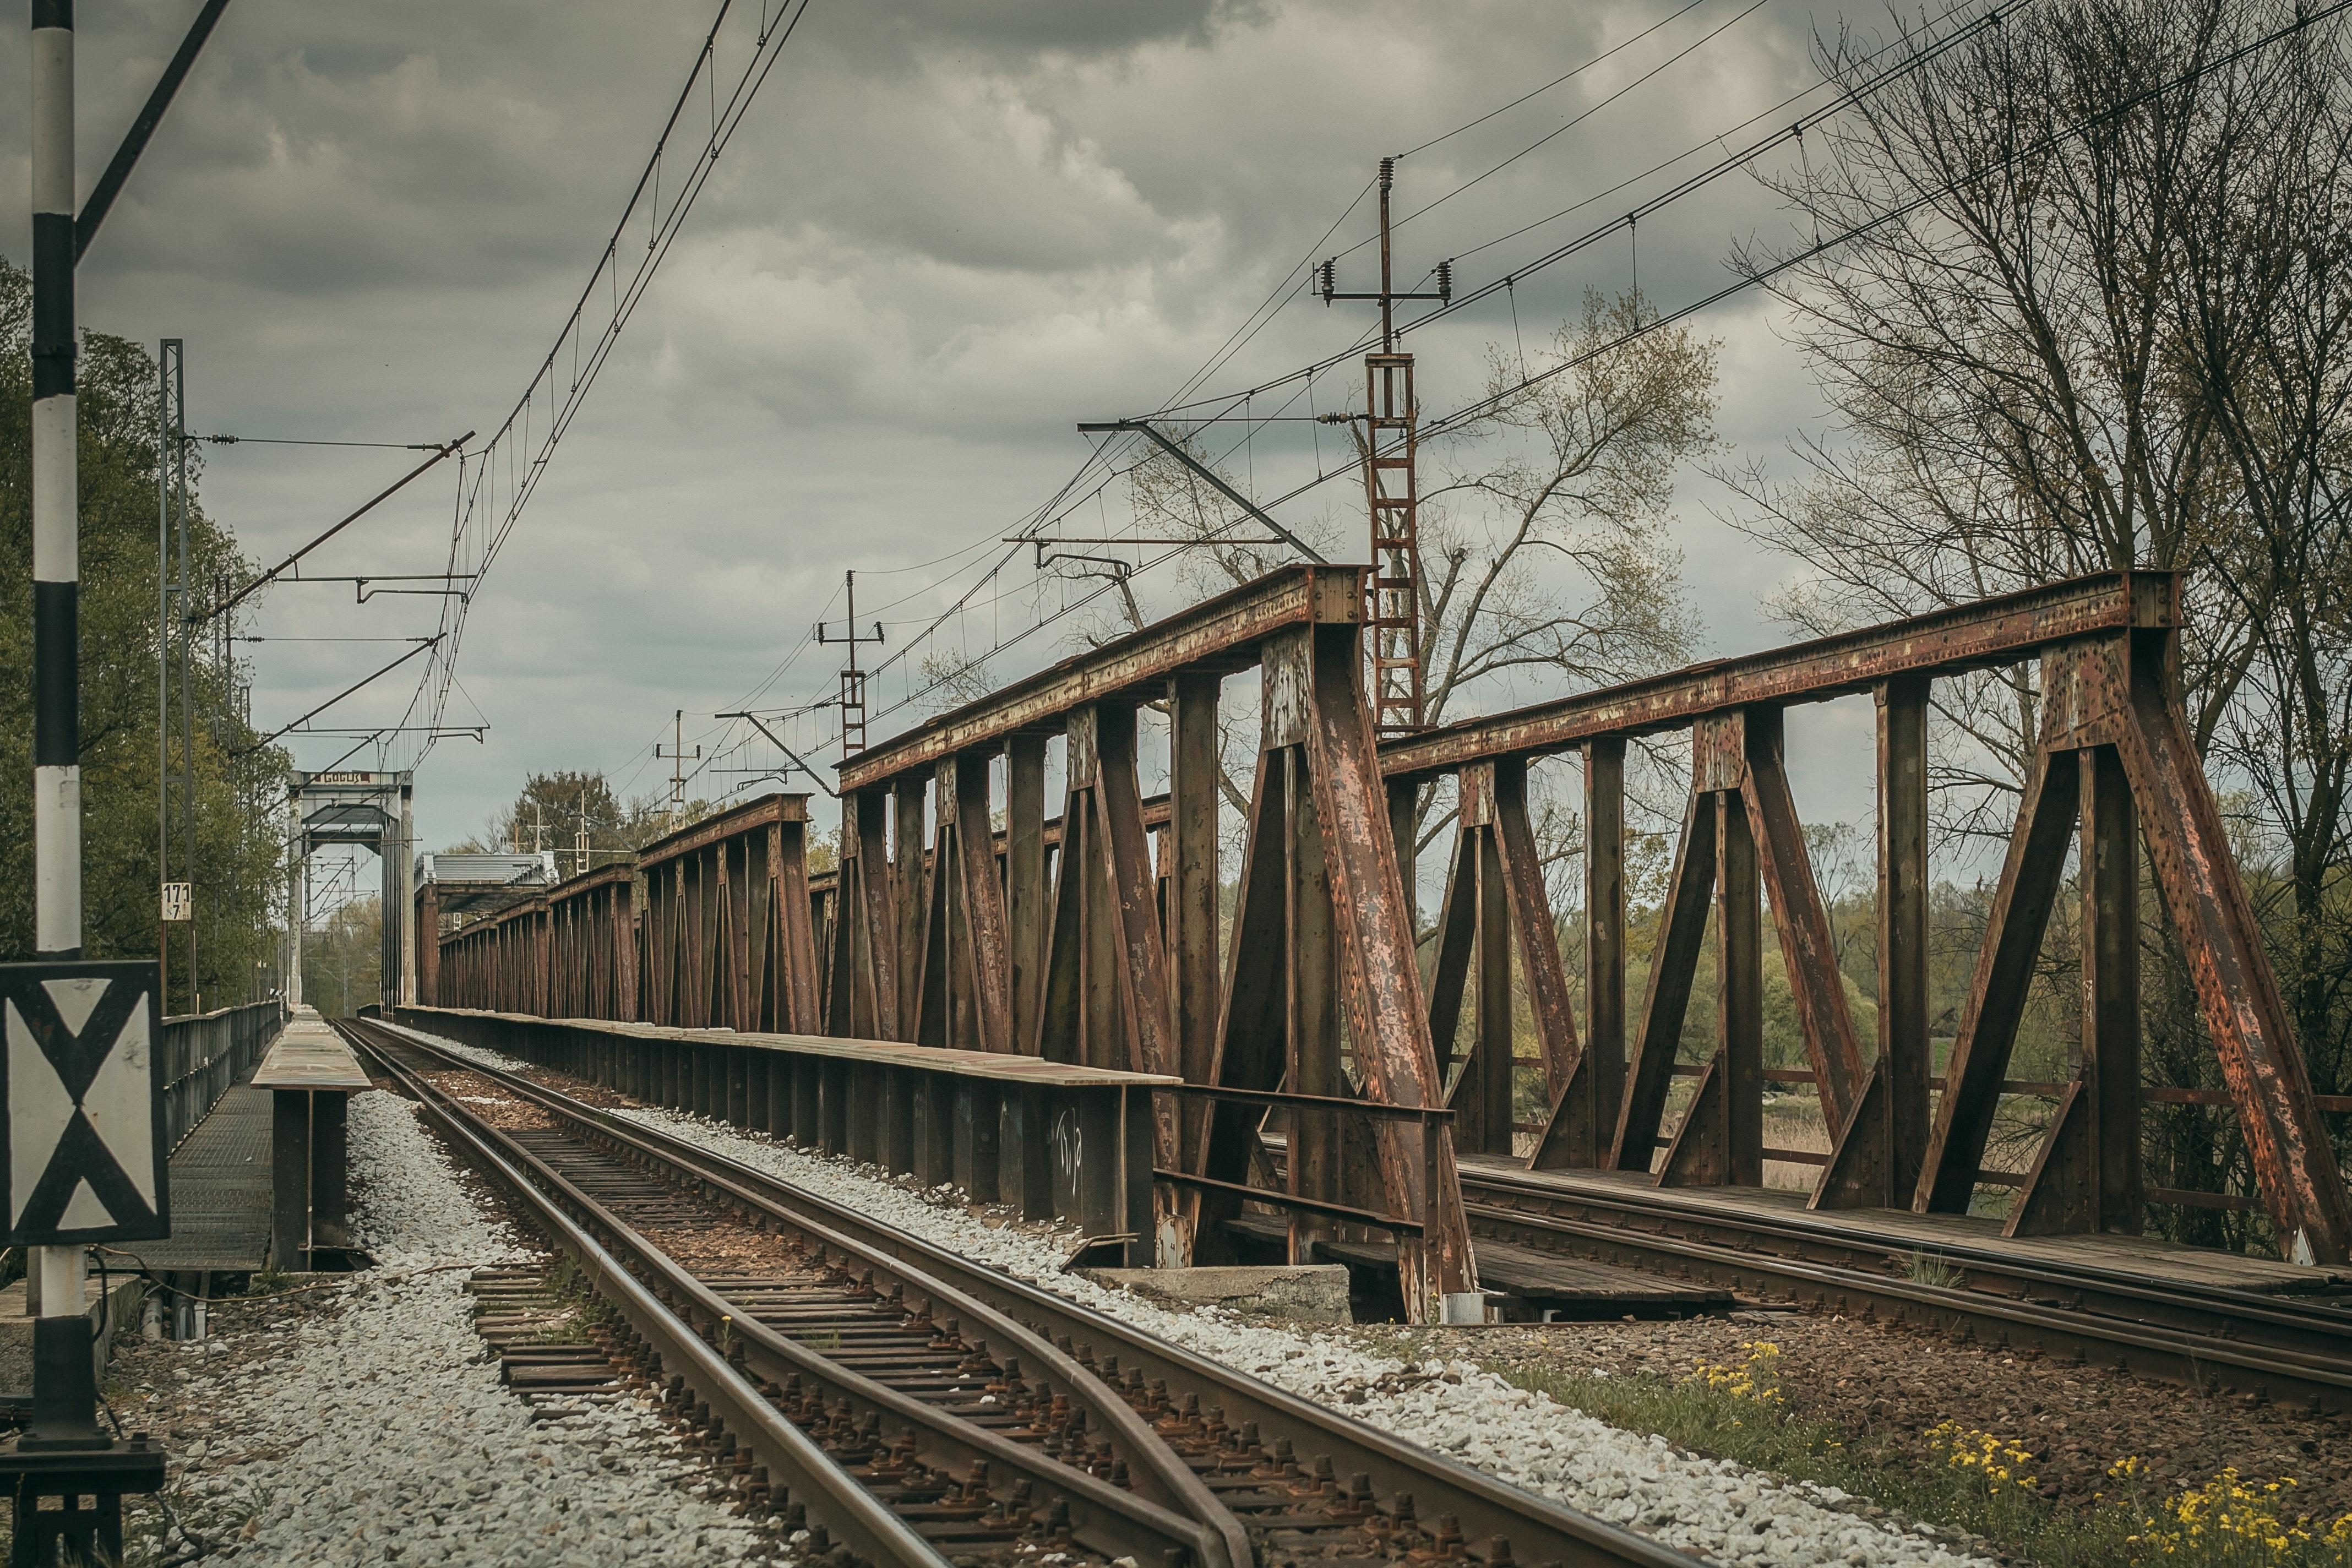 Railroad Tracks Against Sky, Architecture, Railway, Transportation system, Train, HQ Photo